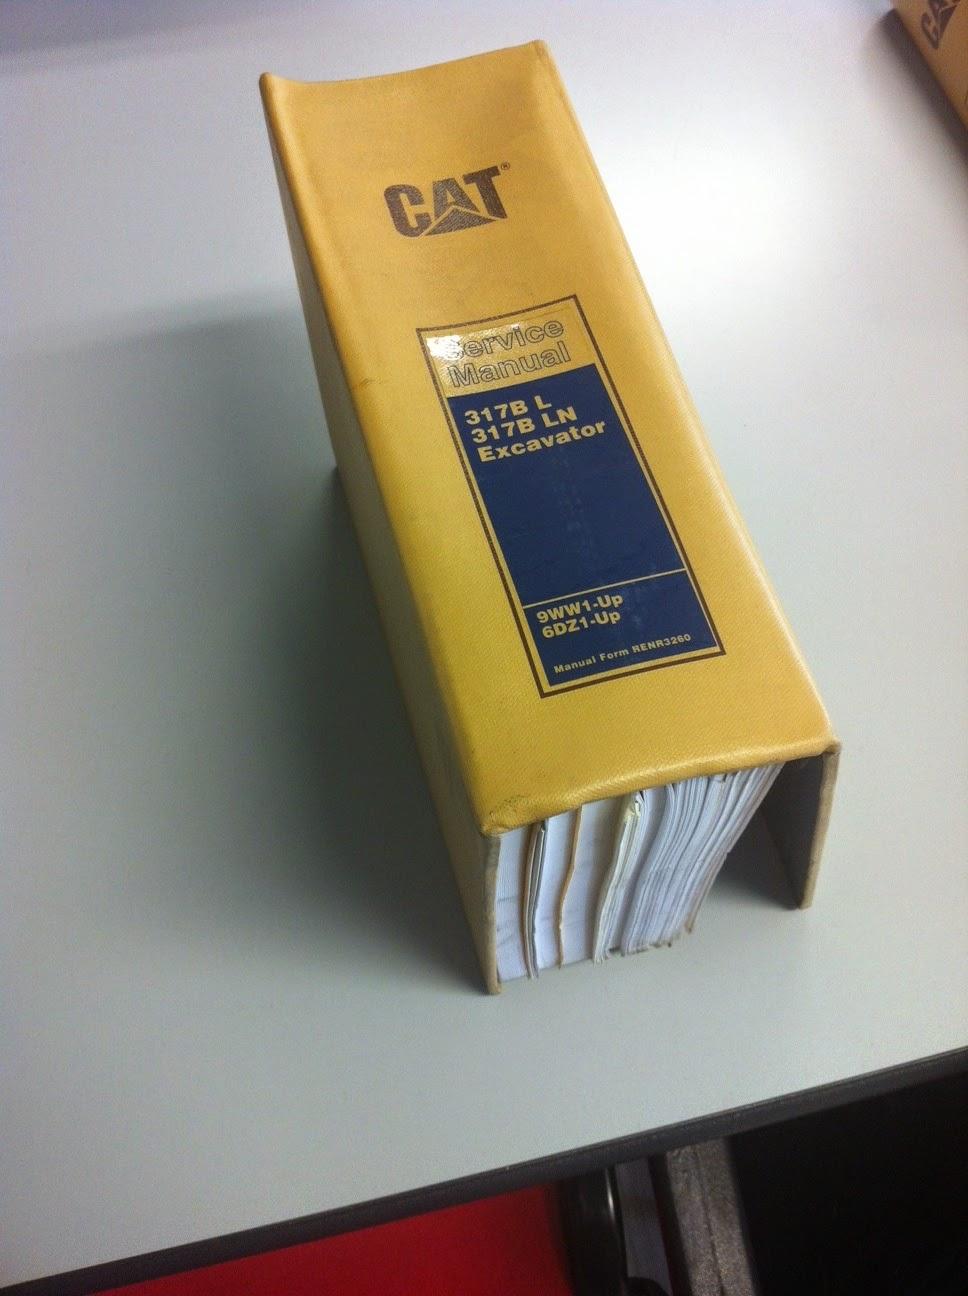 CATERPILLAR CAT 317BL 317BLN EXCAVATOR SERVICE MANUAL #674